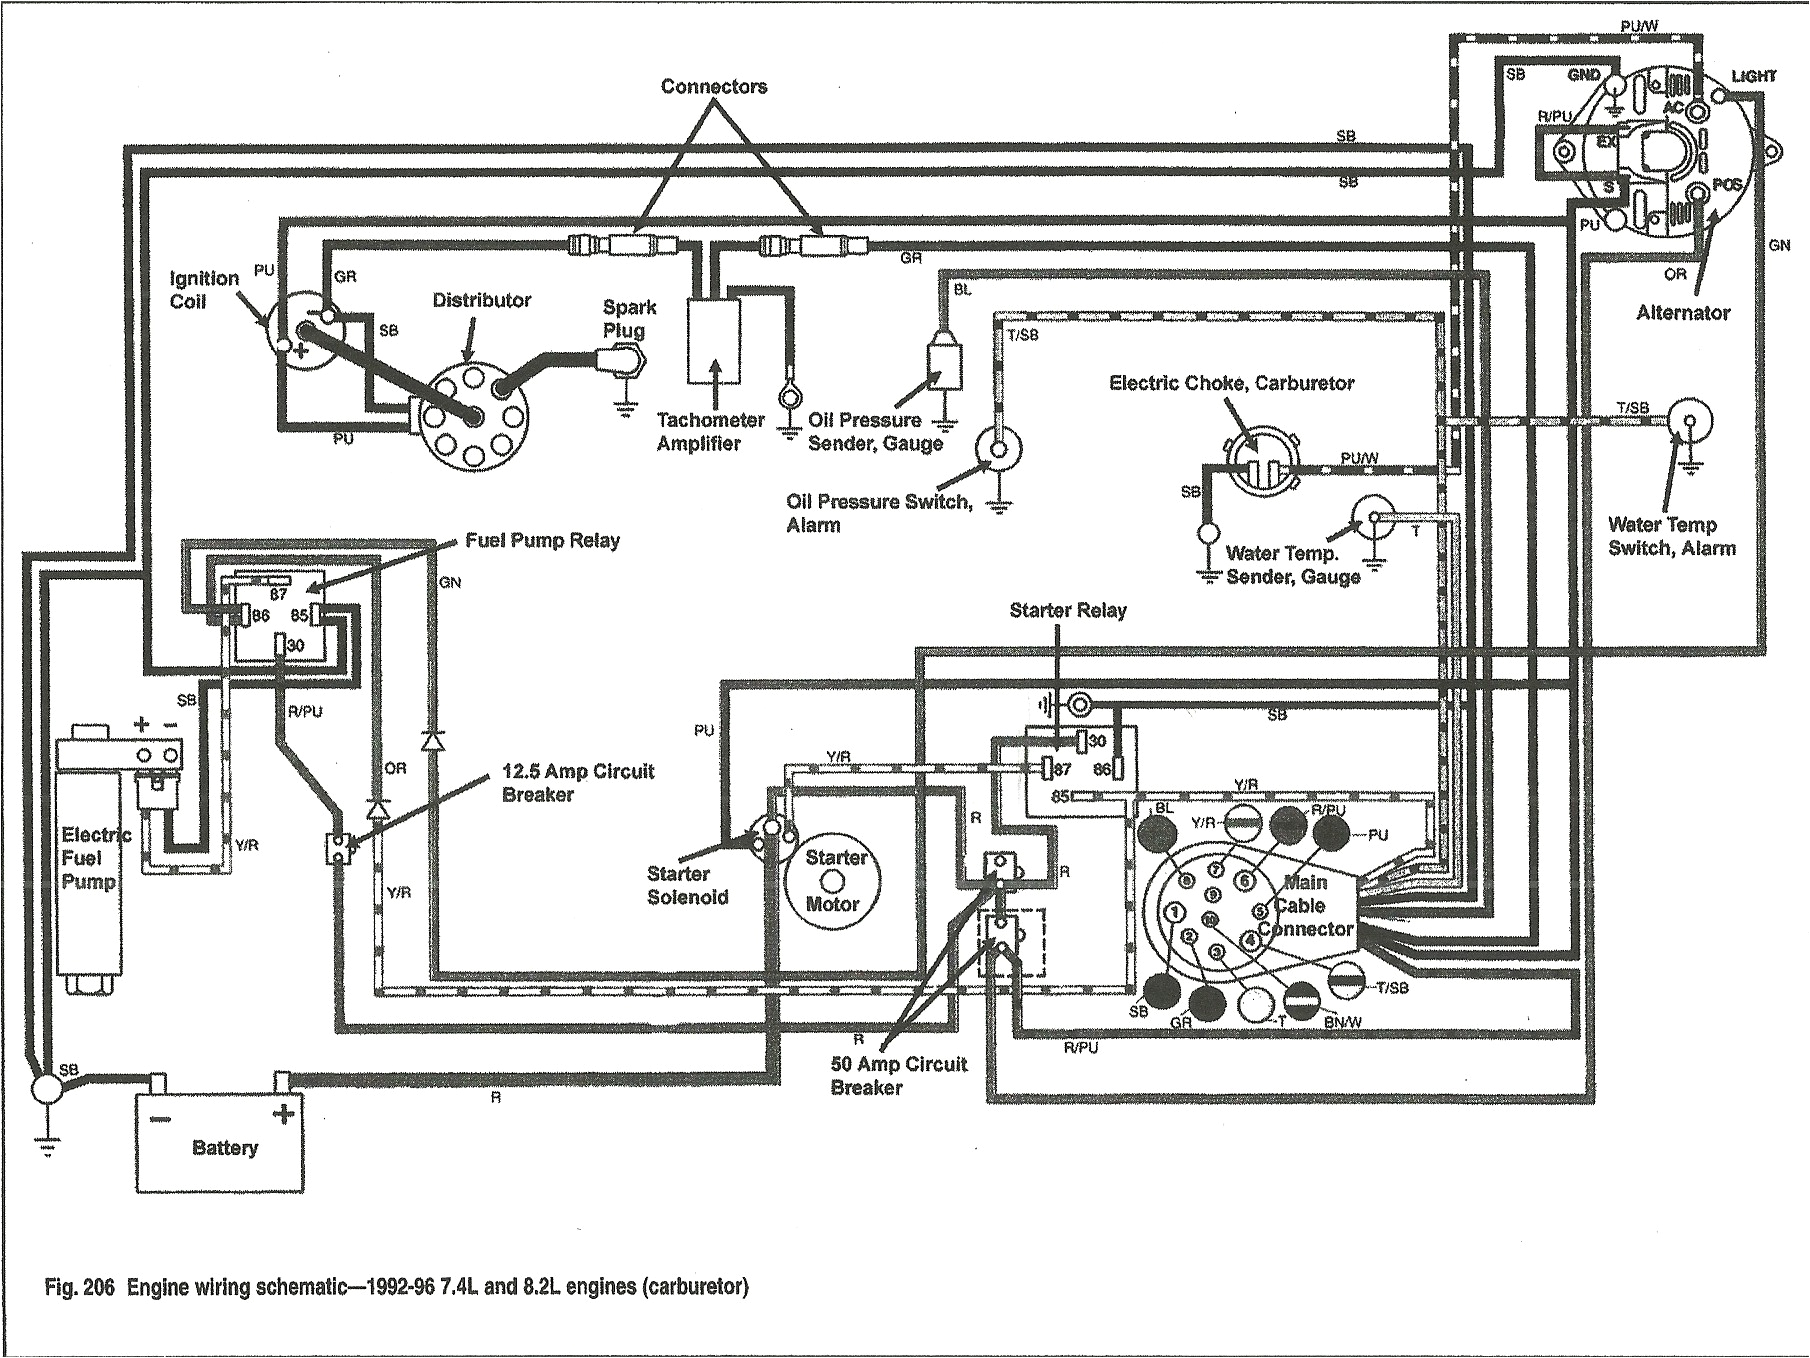 volvo evc wiring diagram wiring diagram rows volvo penta wiring harness diagram